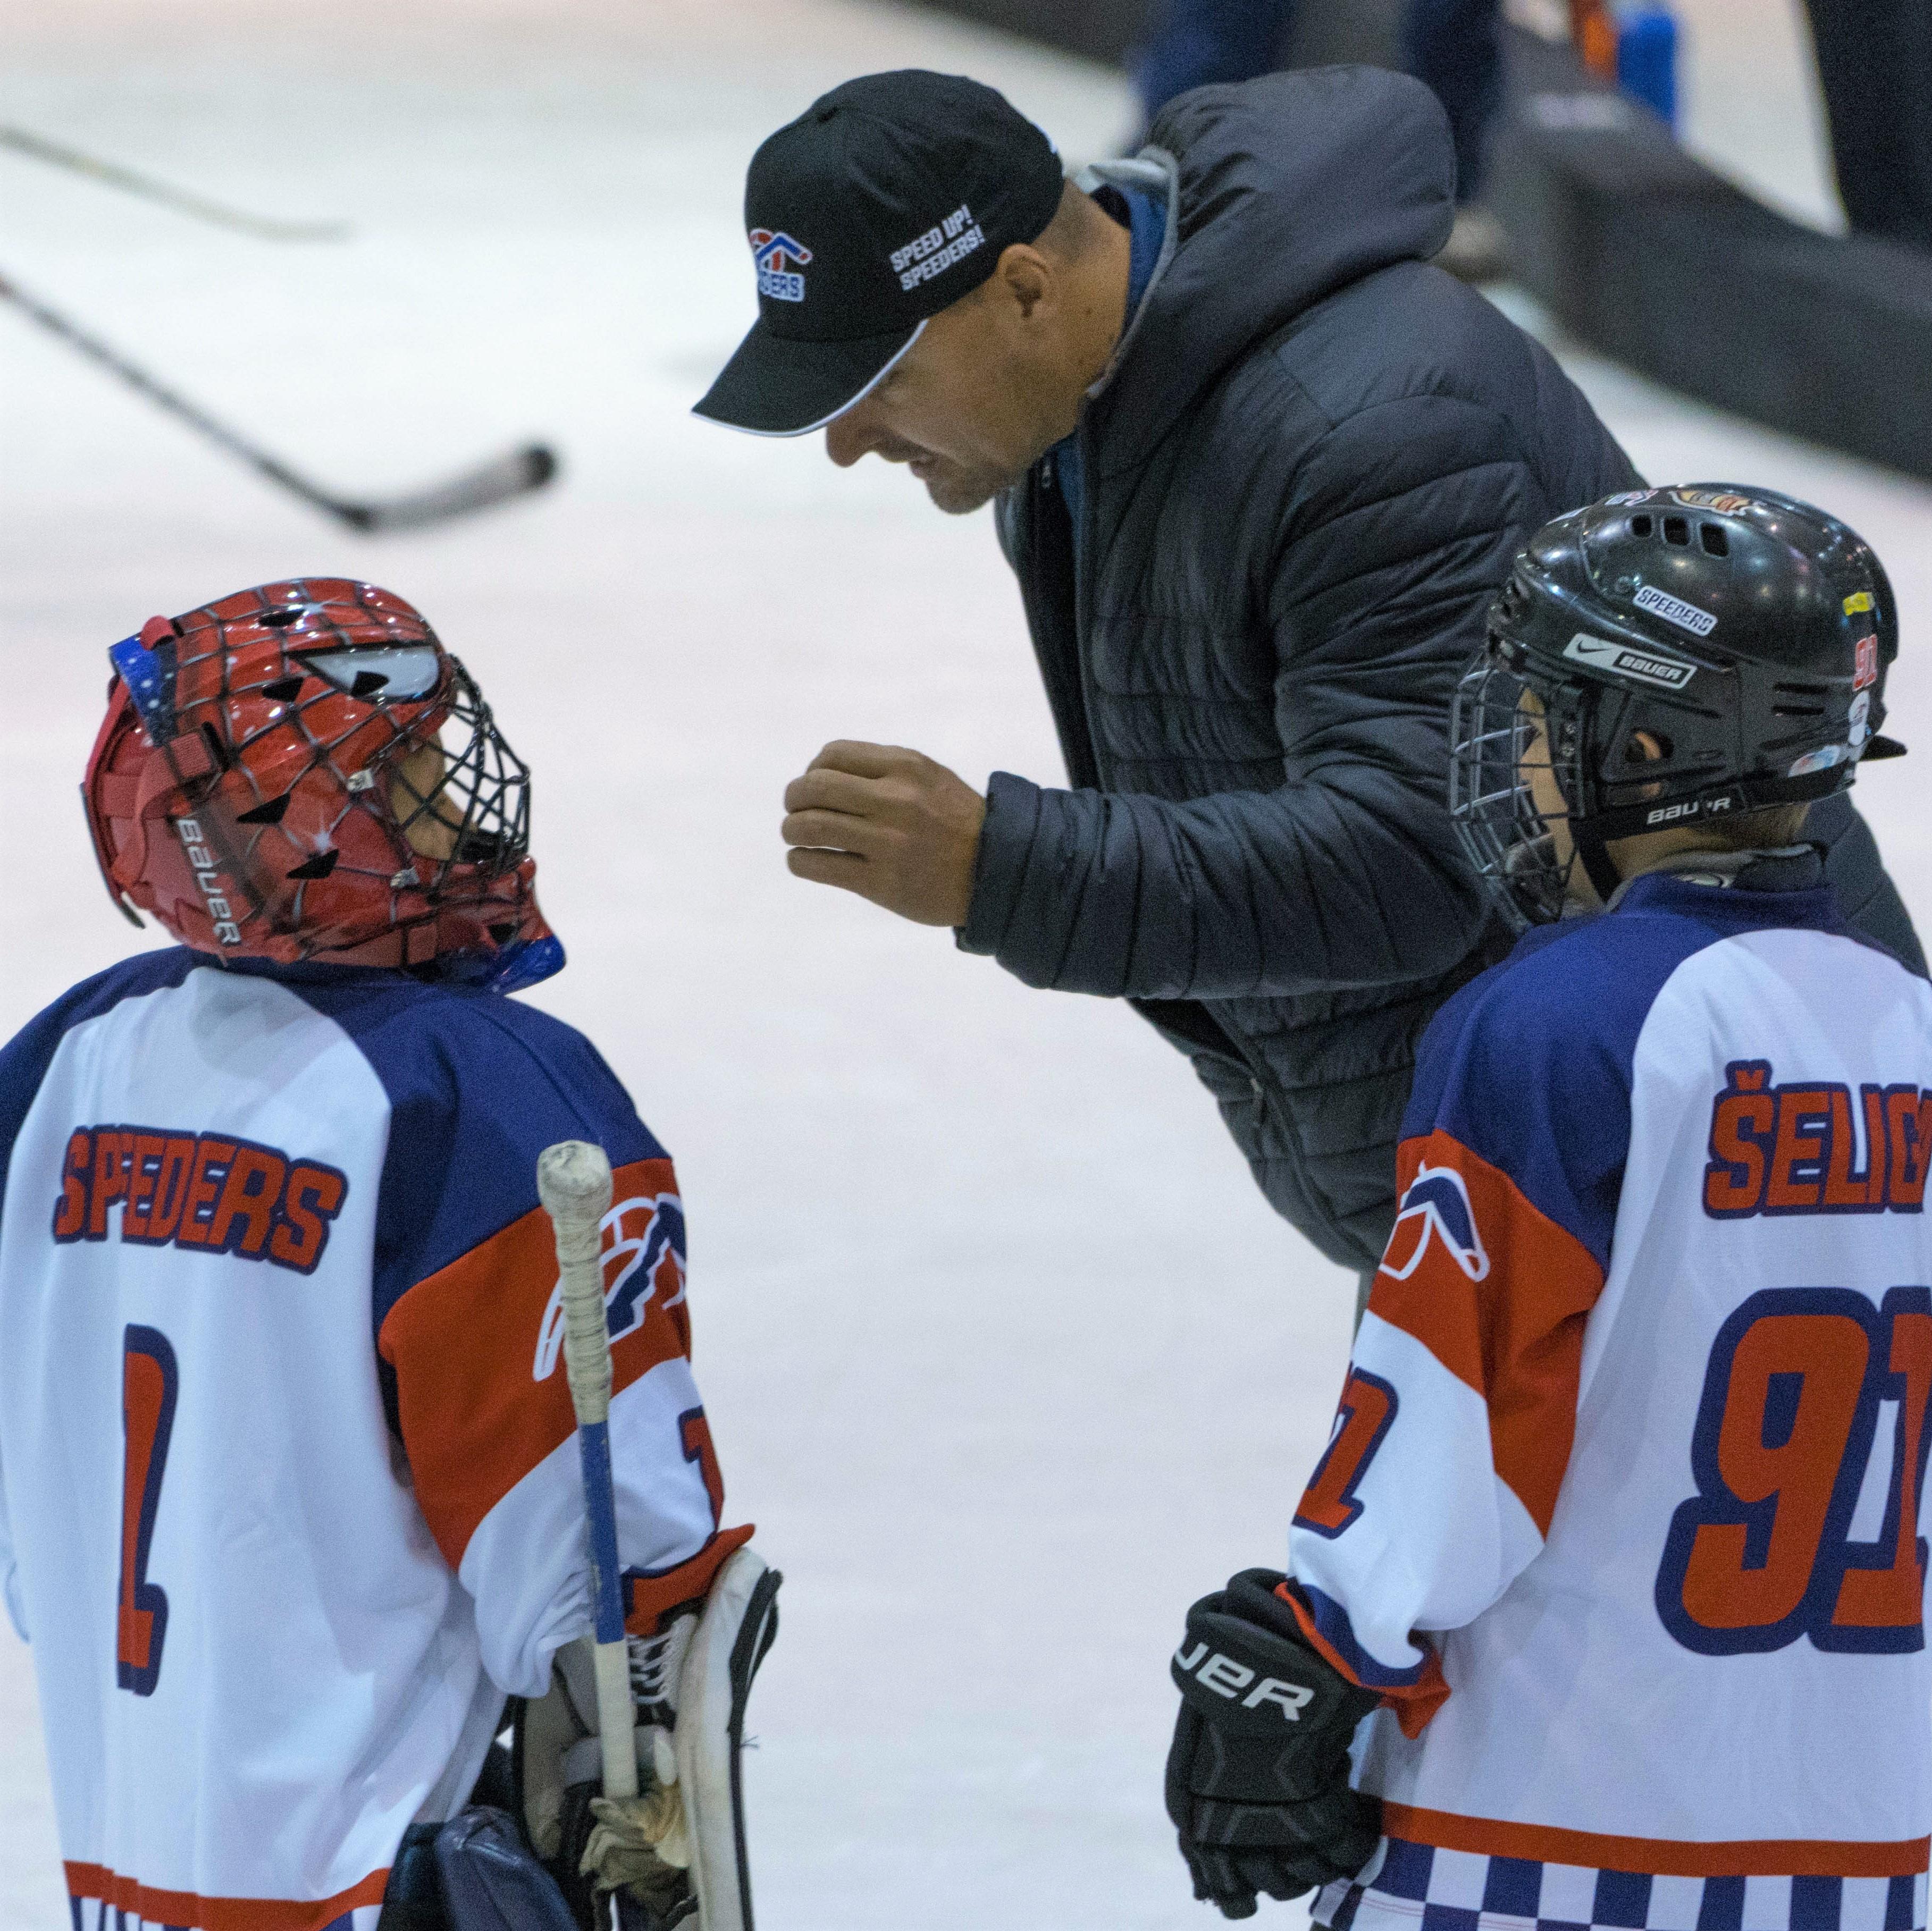 Speeders_sezona 2018_19 hokej turnaj lucenec